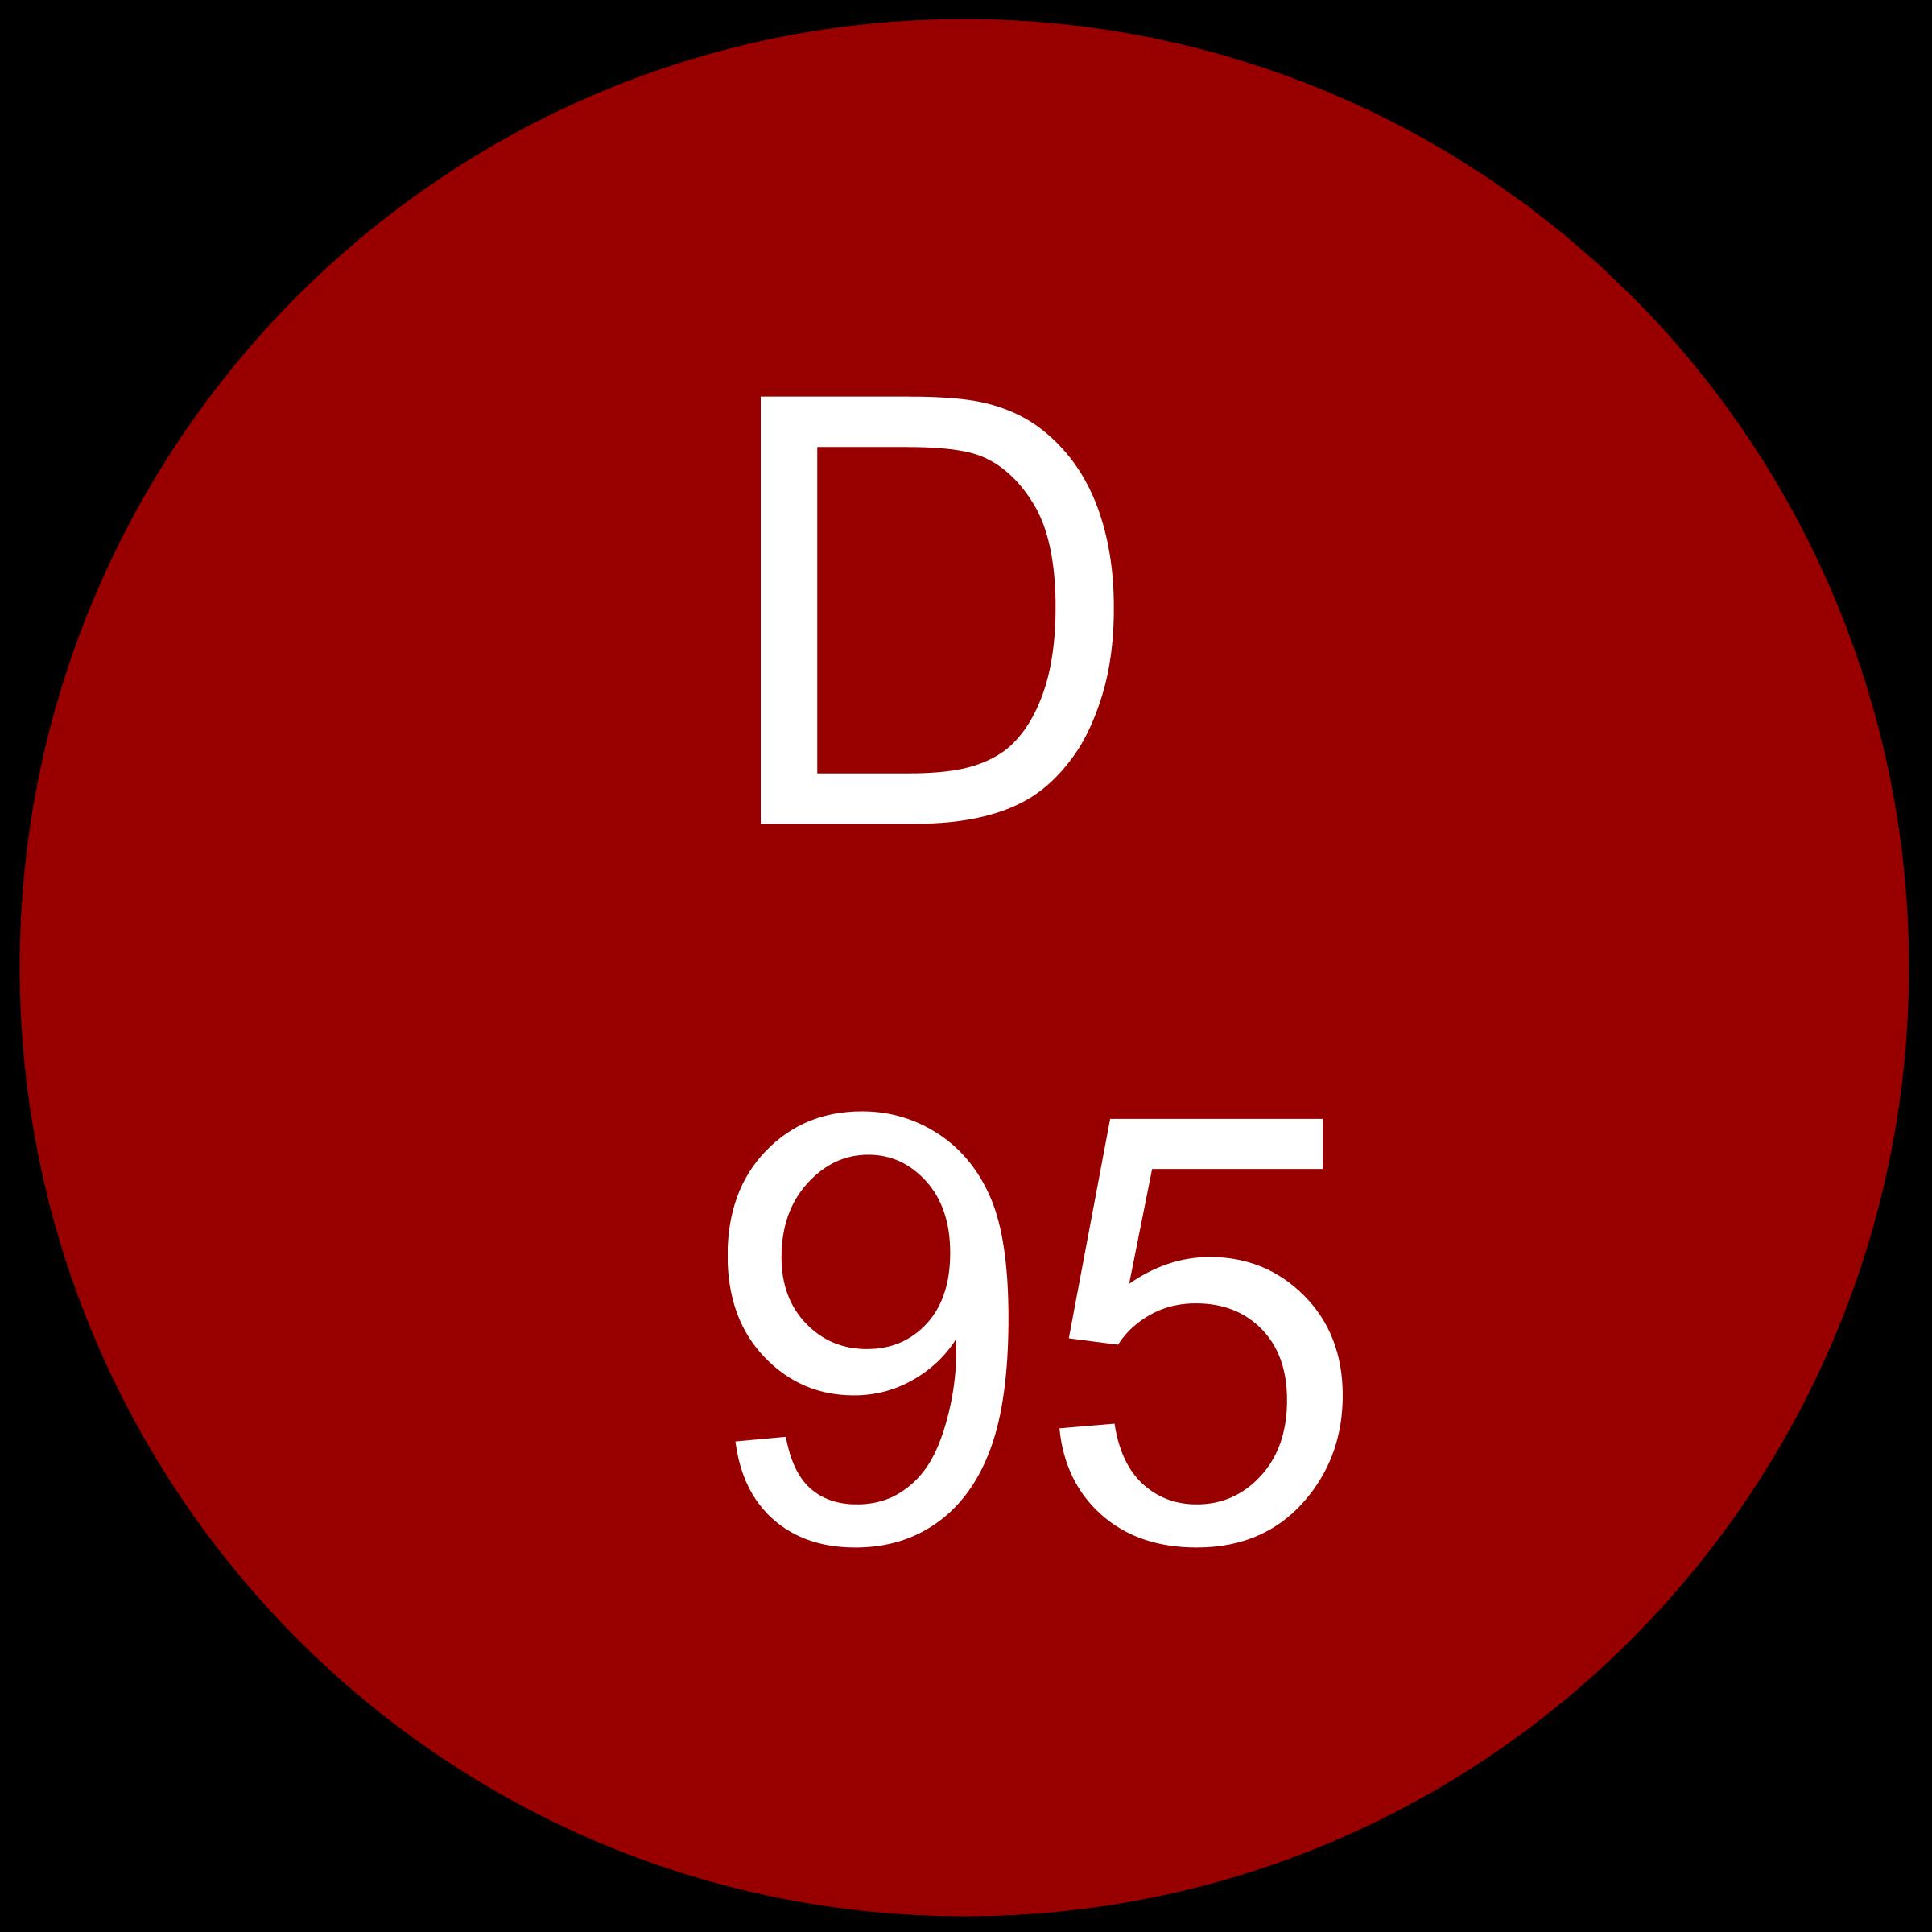 decanter-95